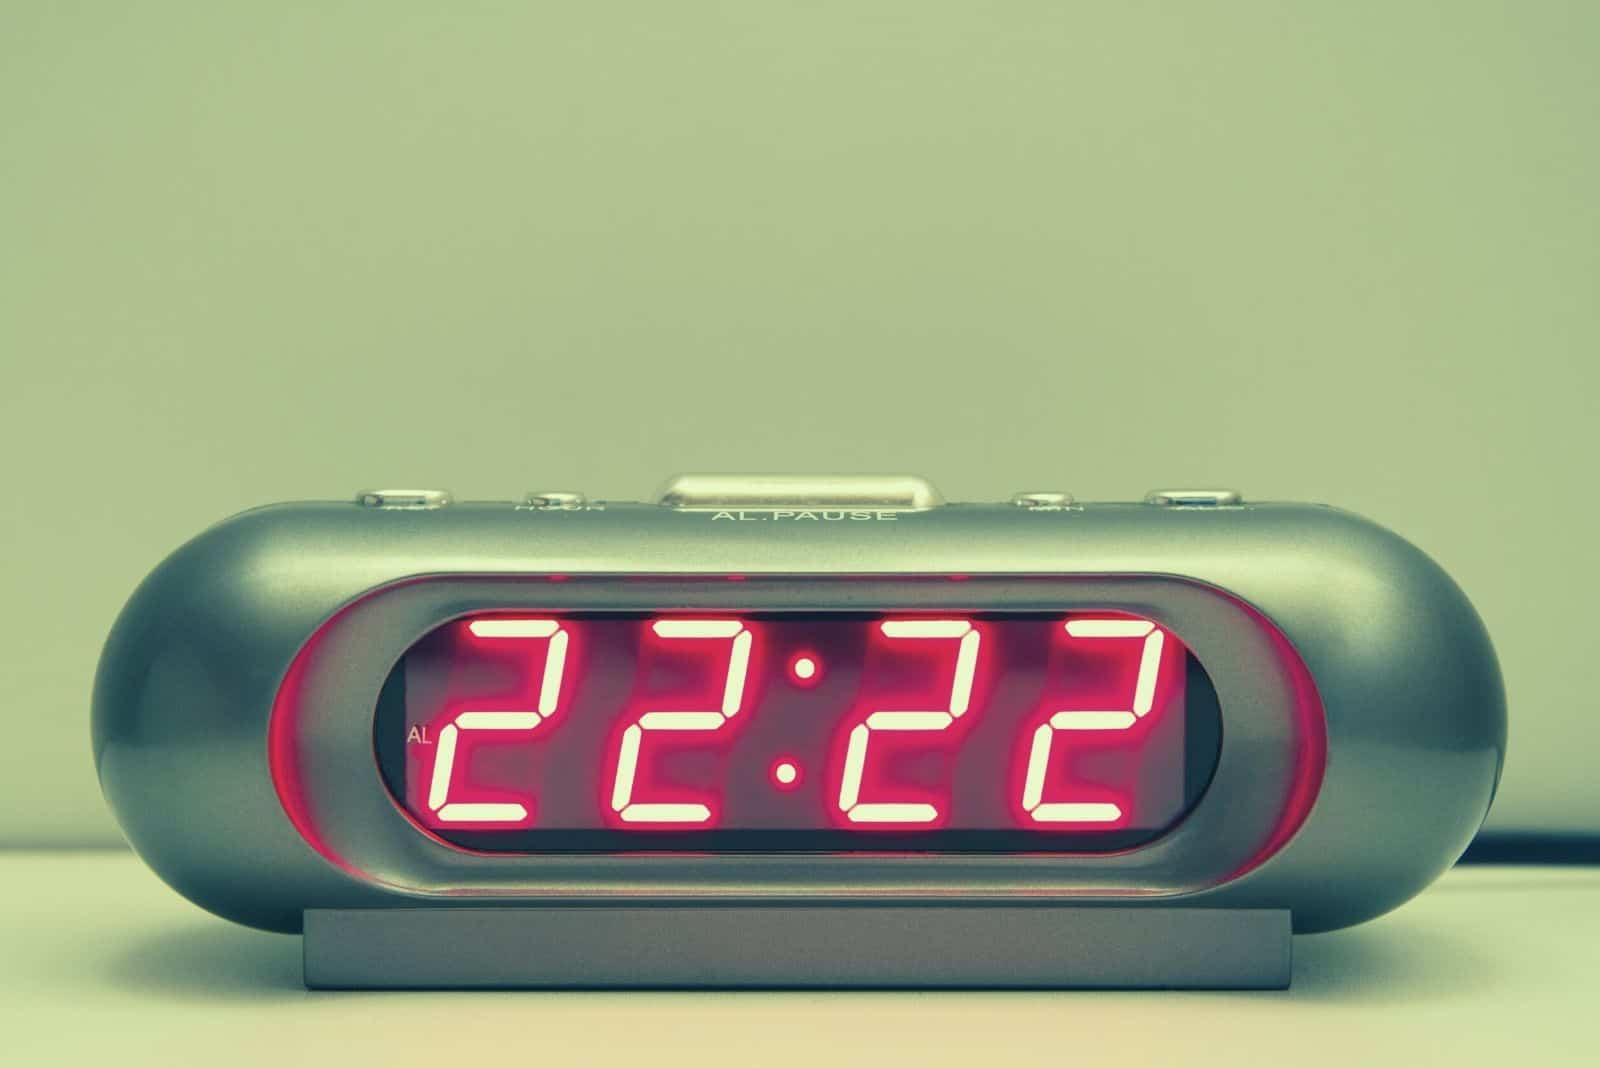 digitale uhrzeit um 22:22 Uhr im Fokus Fotografie